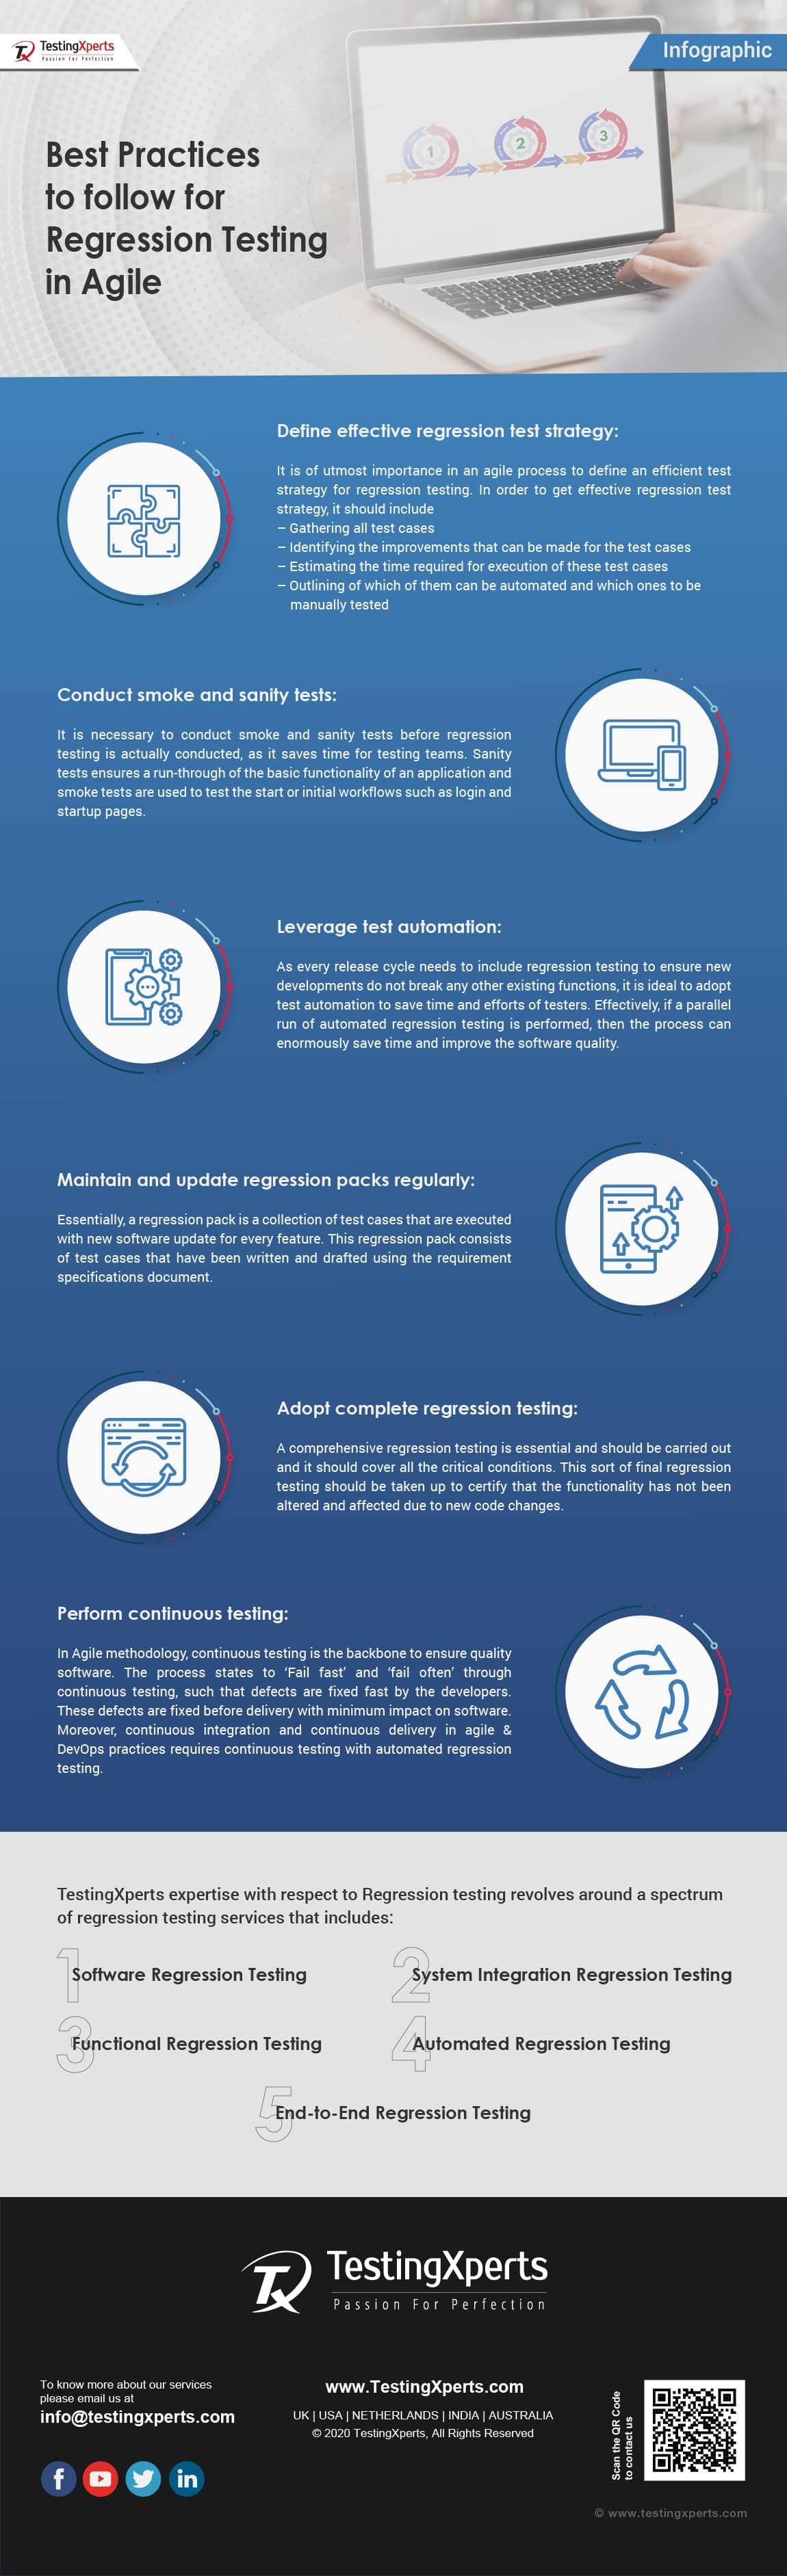 Regression Testing best practices